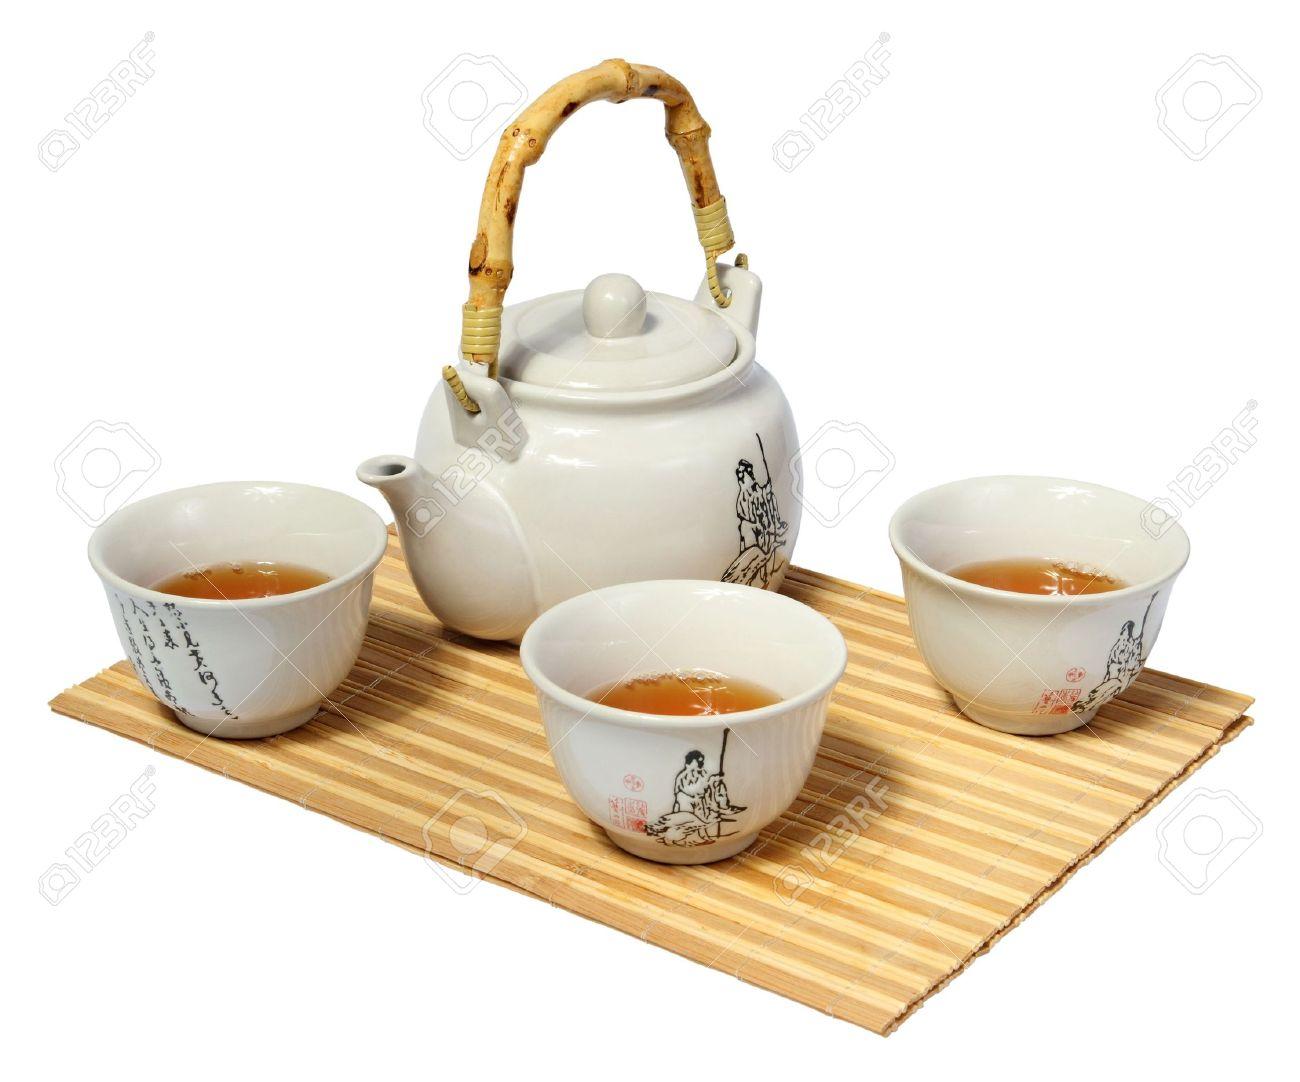 Comfy Wicker Basket Chinese Tea Set Wedding Stock Photo Chinese Tea Set On A Background Chinese Tea Set On A Background Stock Chinese Tea Set houzz 01 Chinese Tea Set